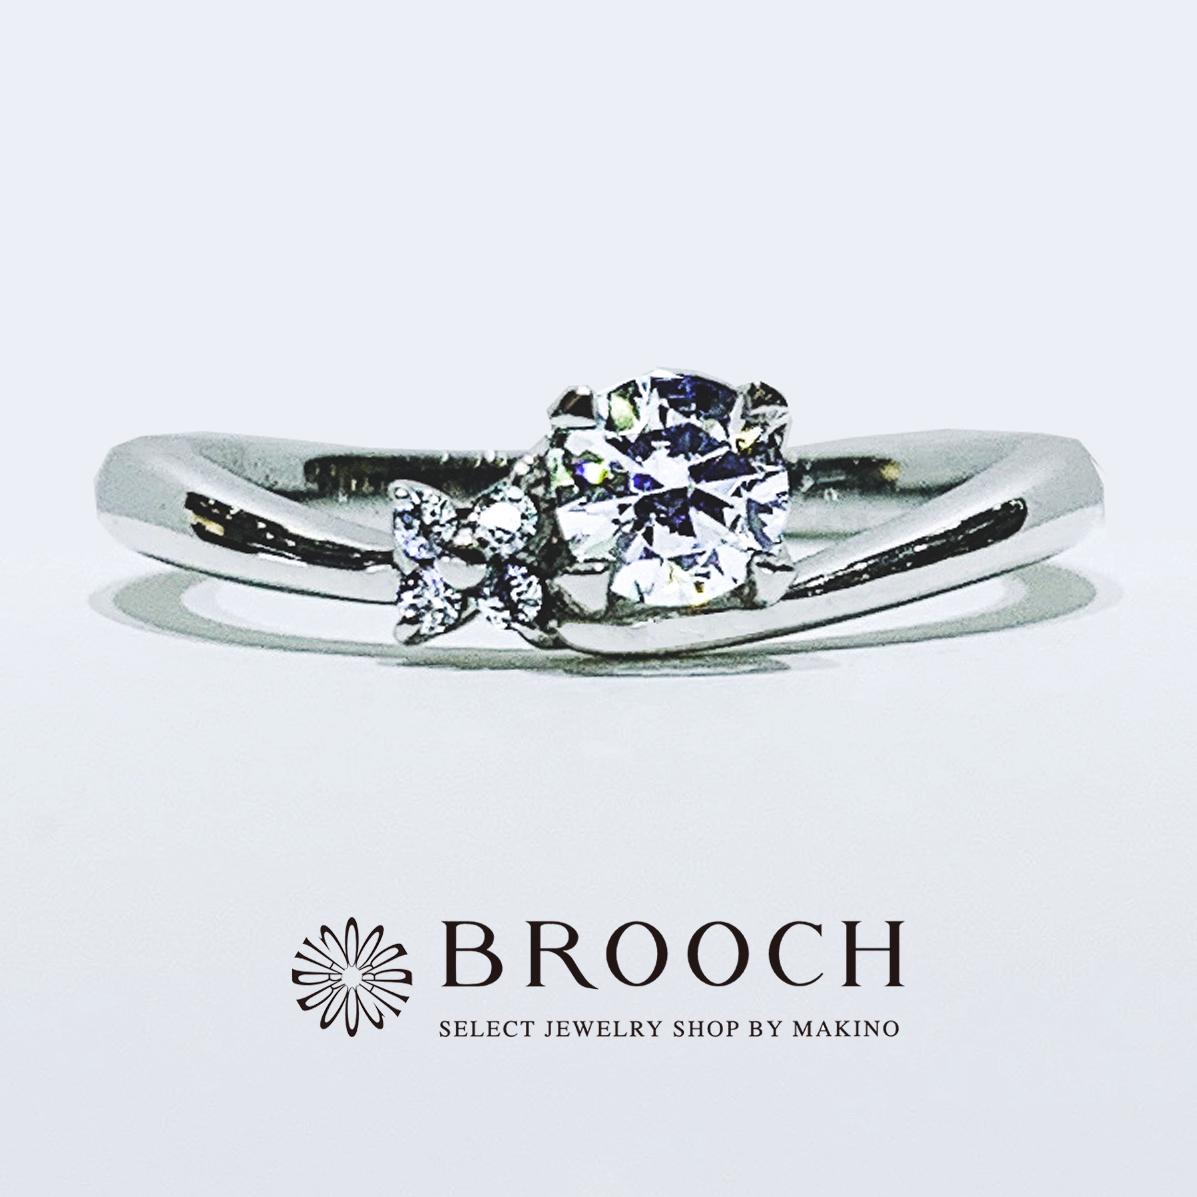 BROOCH 婚約指輪 エンゲージリング かわいい 緩やかなウェーブデザイン